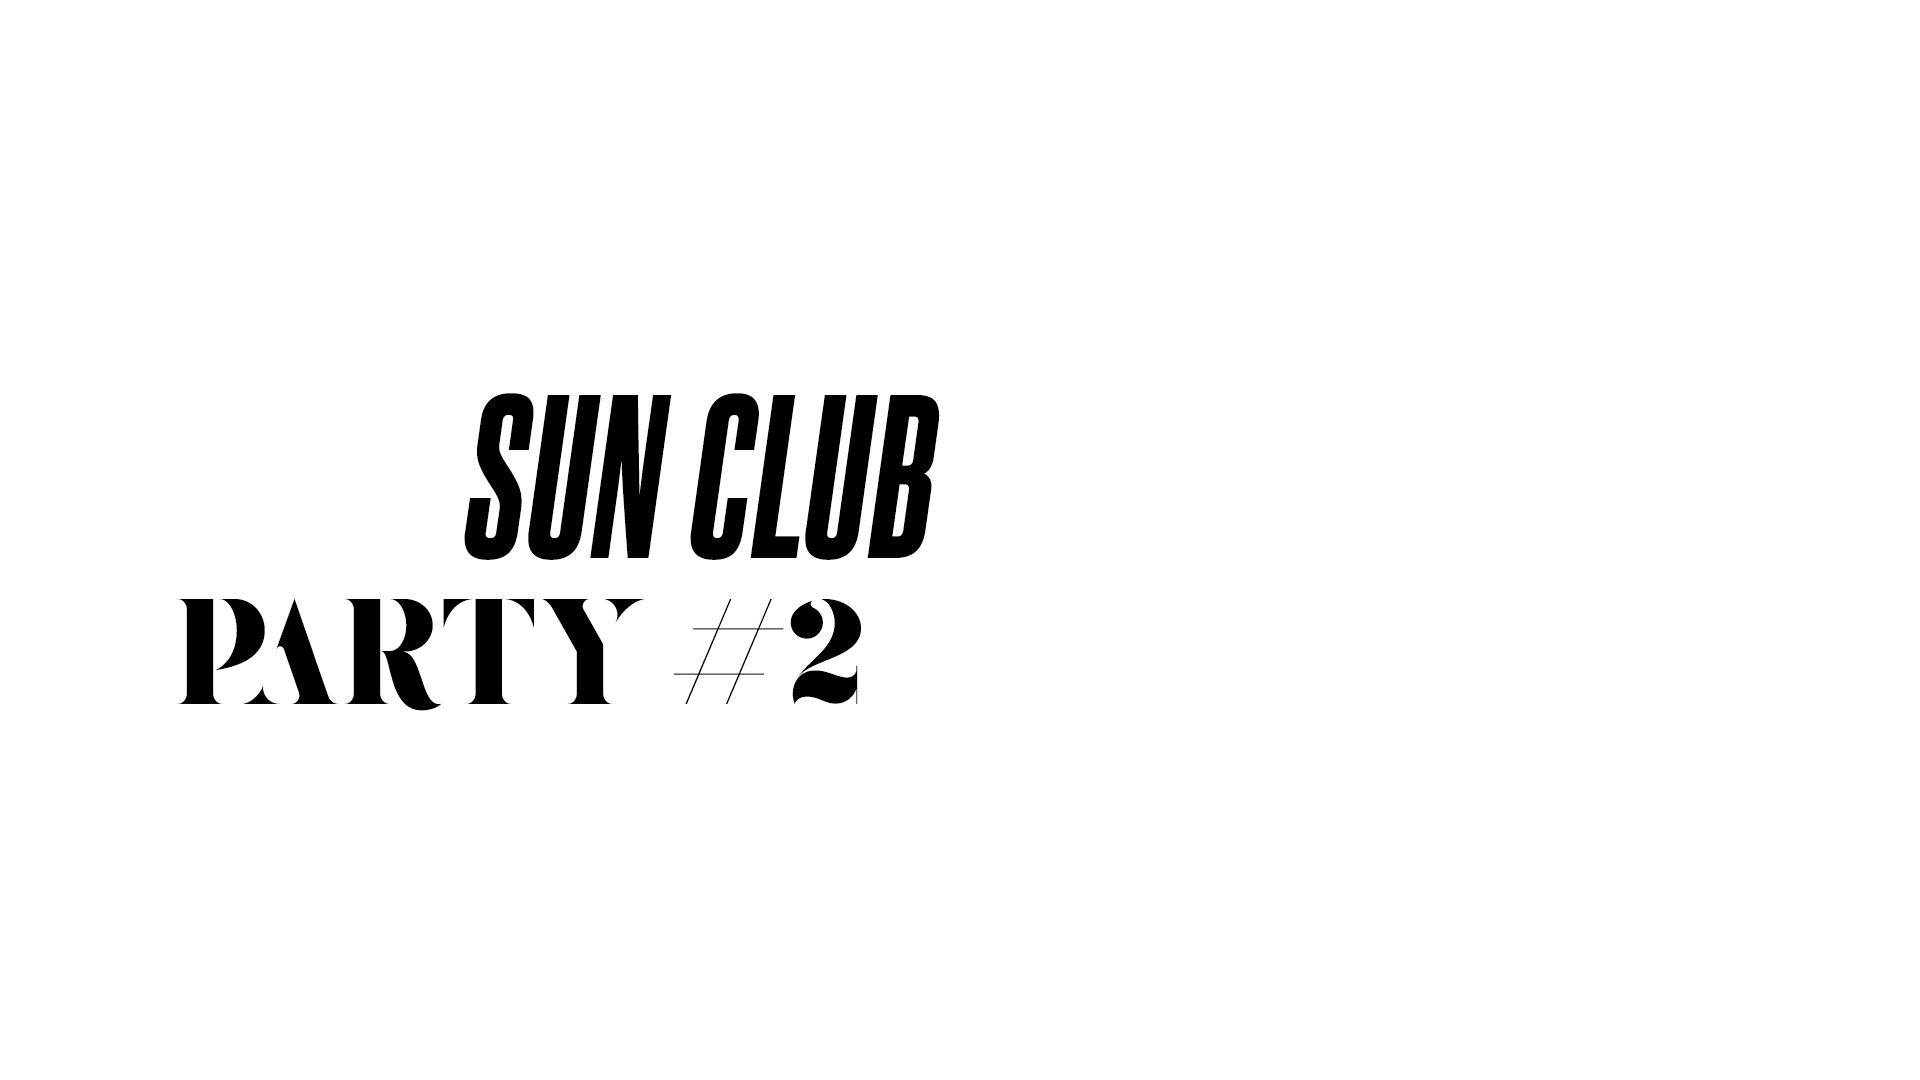 SUN CLUB - PARTY #2